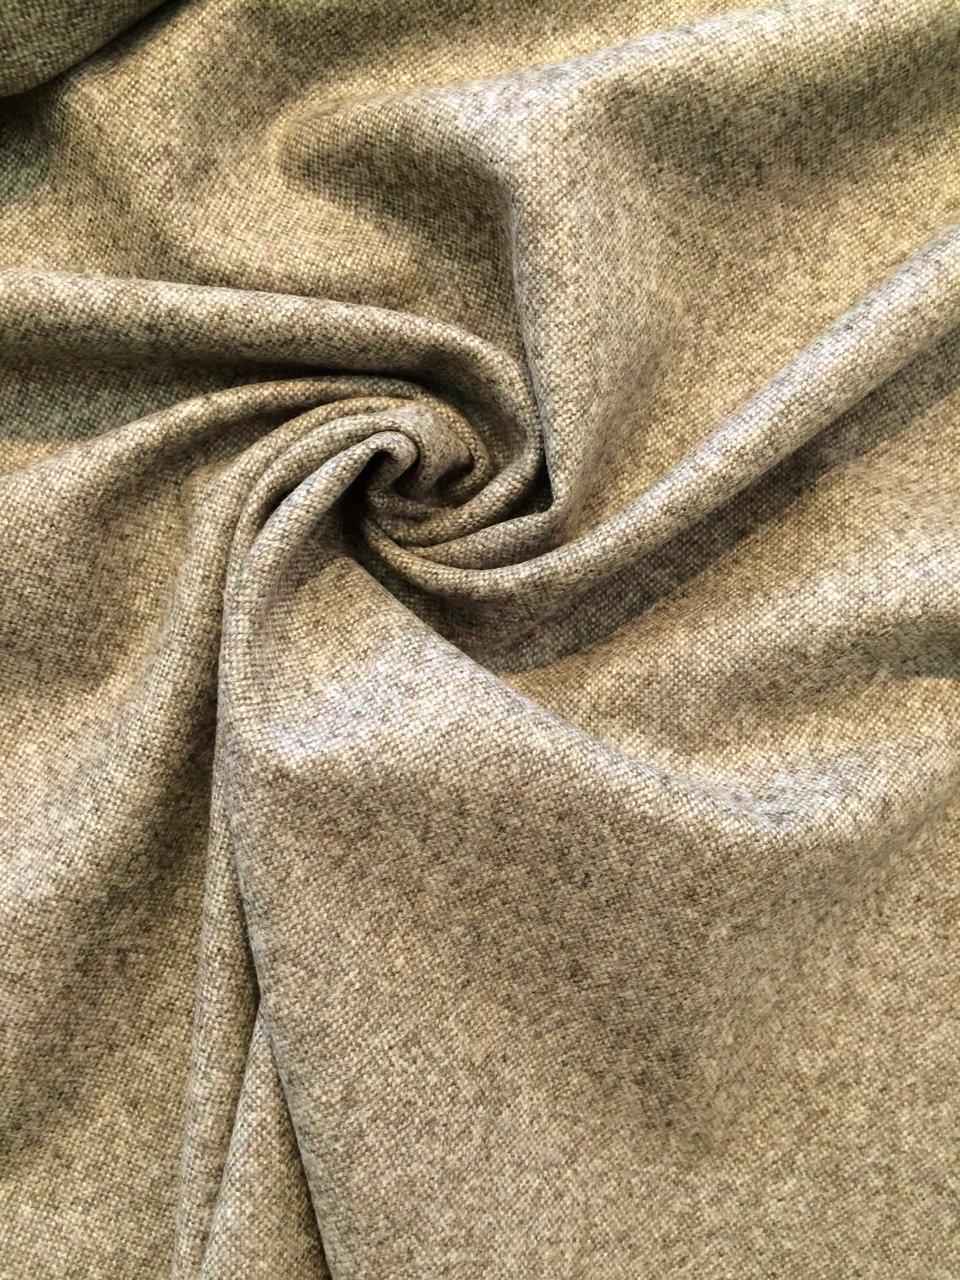 Pale Mocha Wool/ Cashmere Tweed